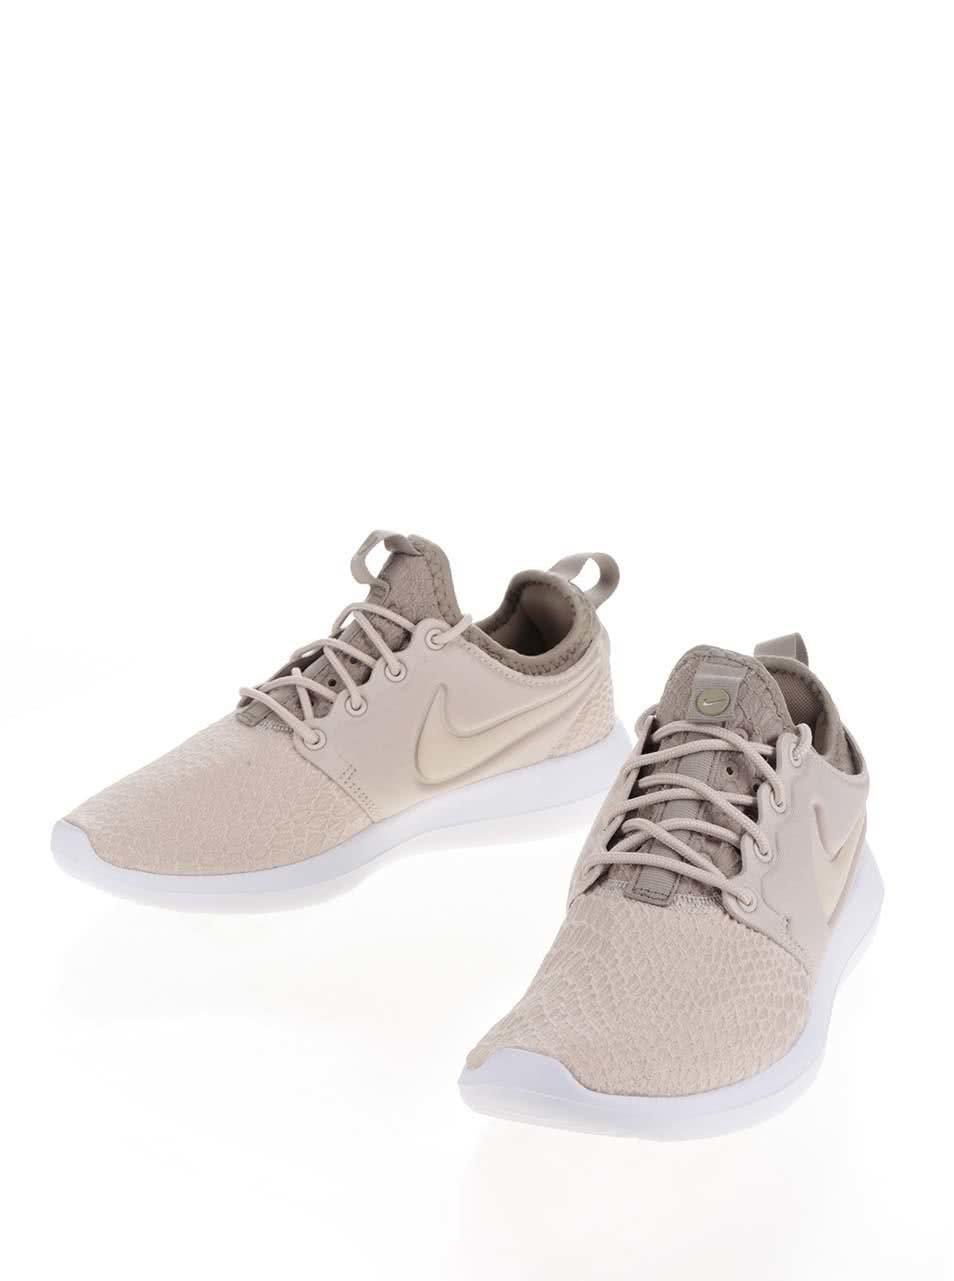 e4ce4d82aa5da Béžové dámske tenisky Nike Roshe | ZOOT.sk